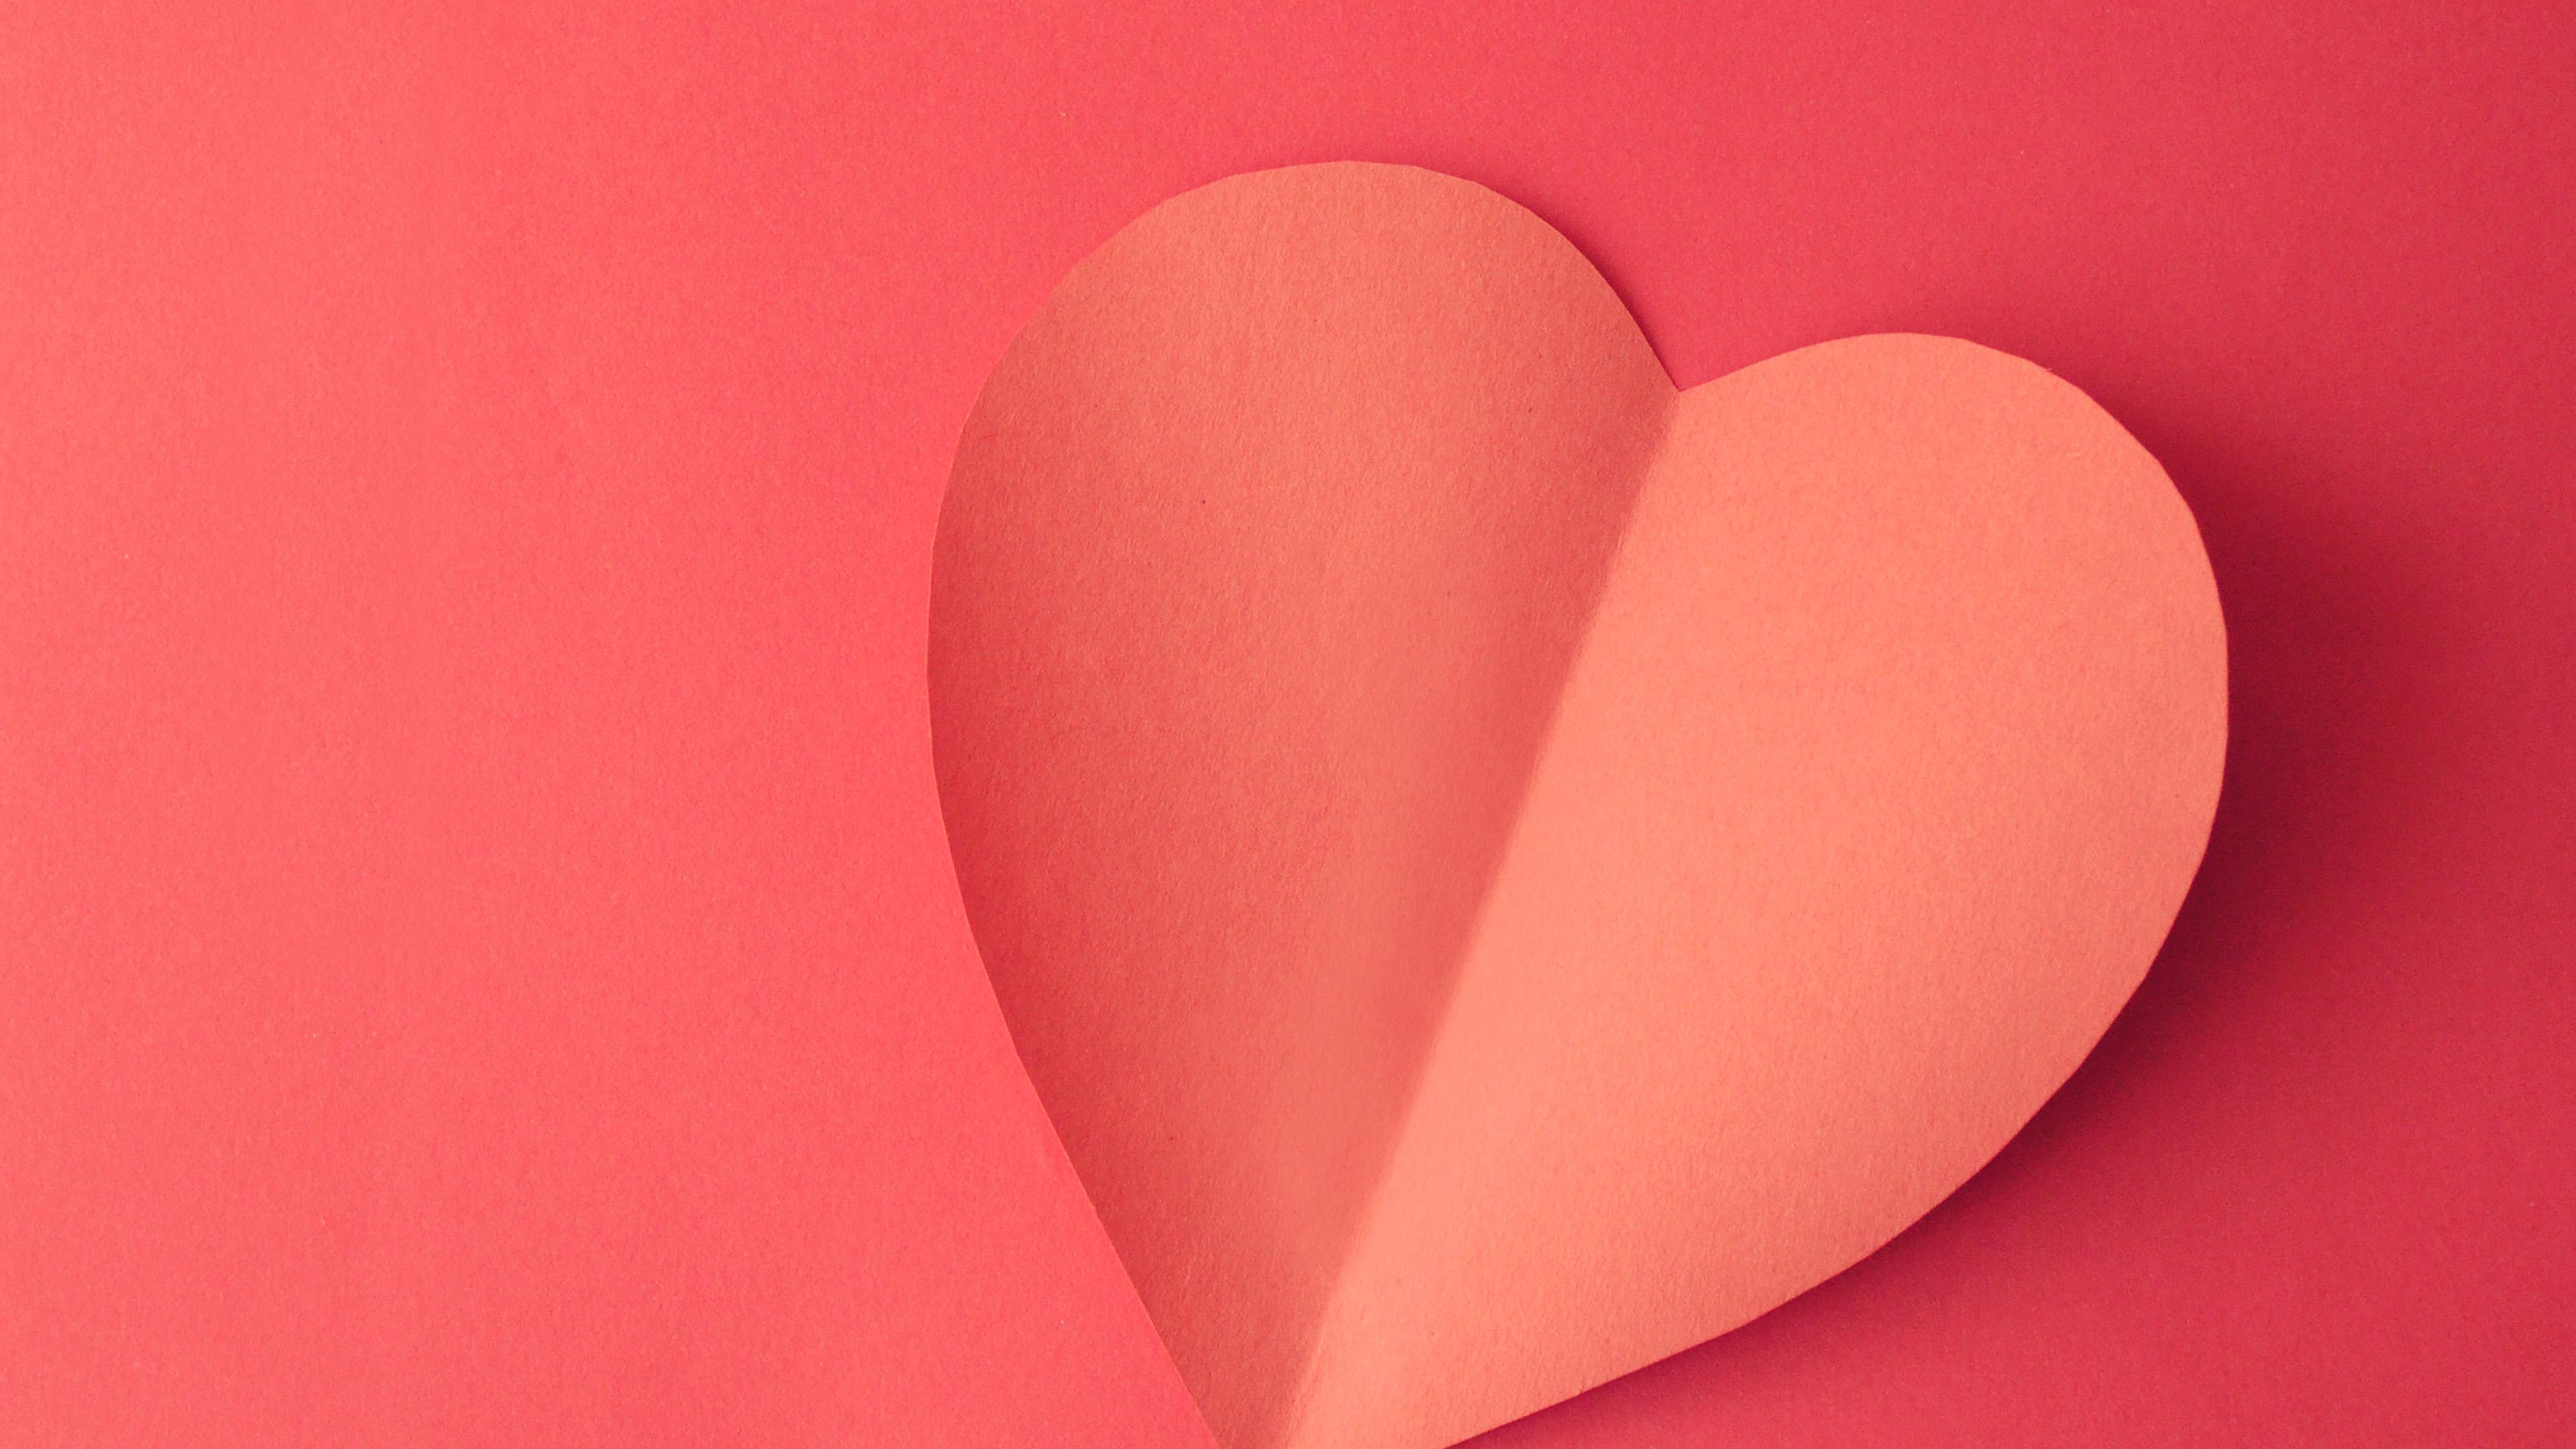 wallpaper for desktop, laptop | ar44-love-pink-heart-minimal